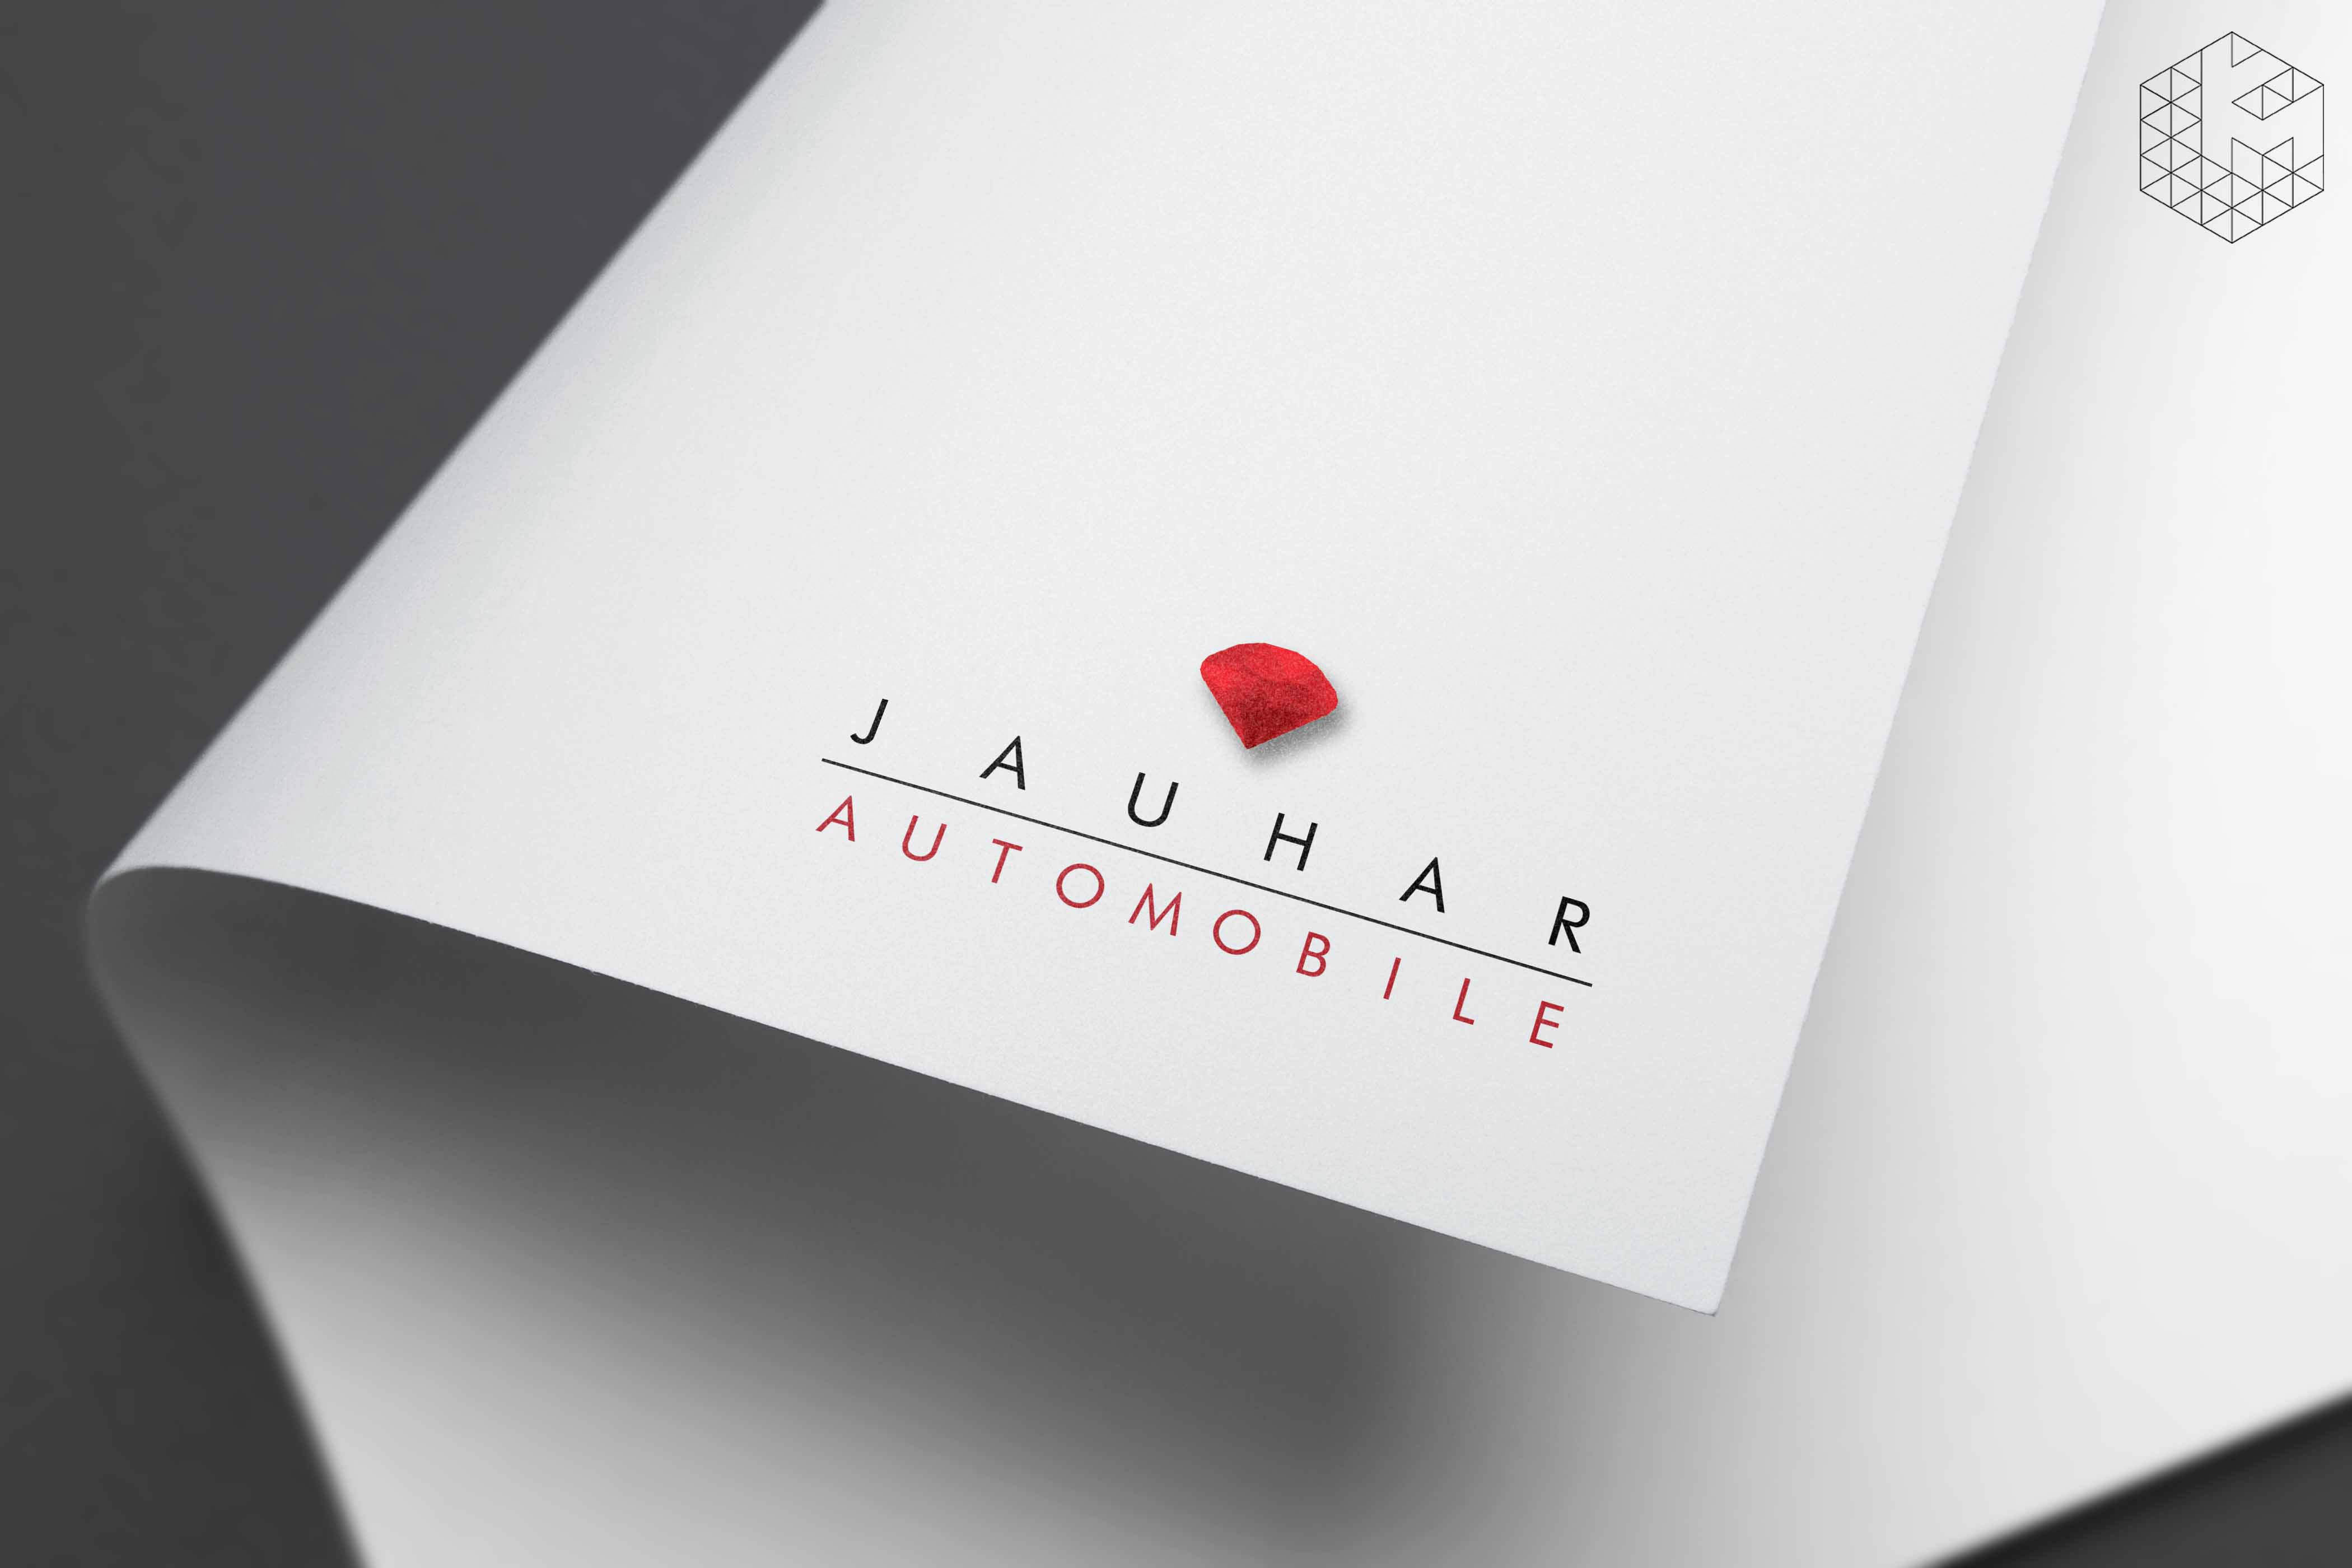 Jauhar Automobile.